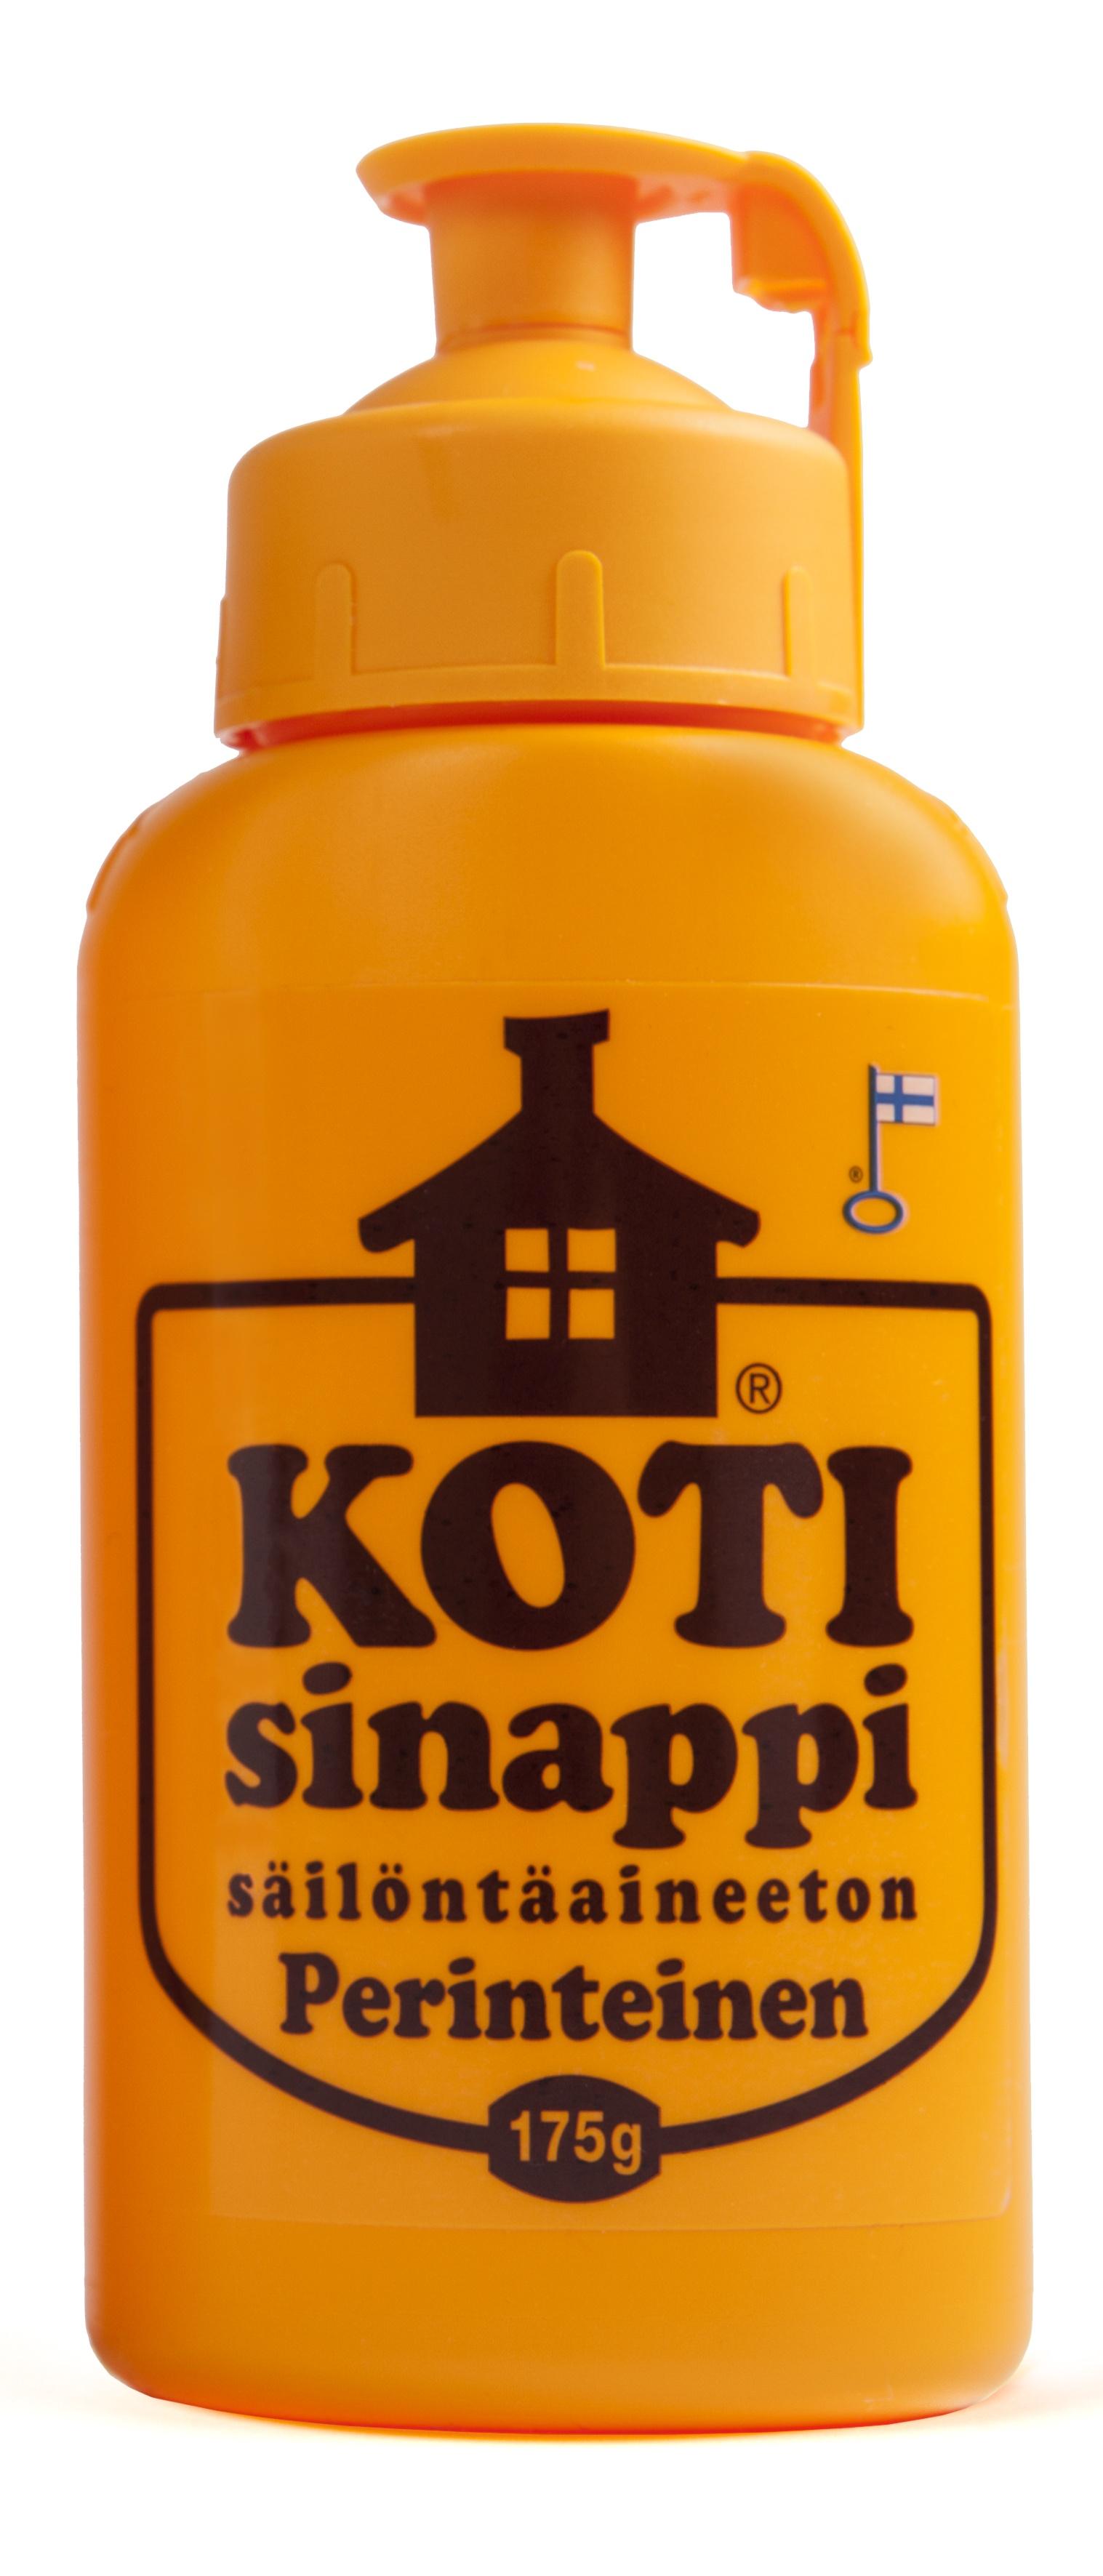 Горчица Koti традиционная